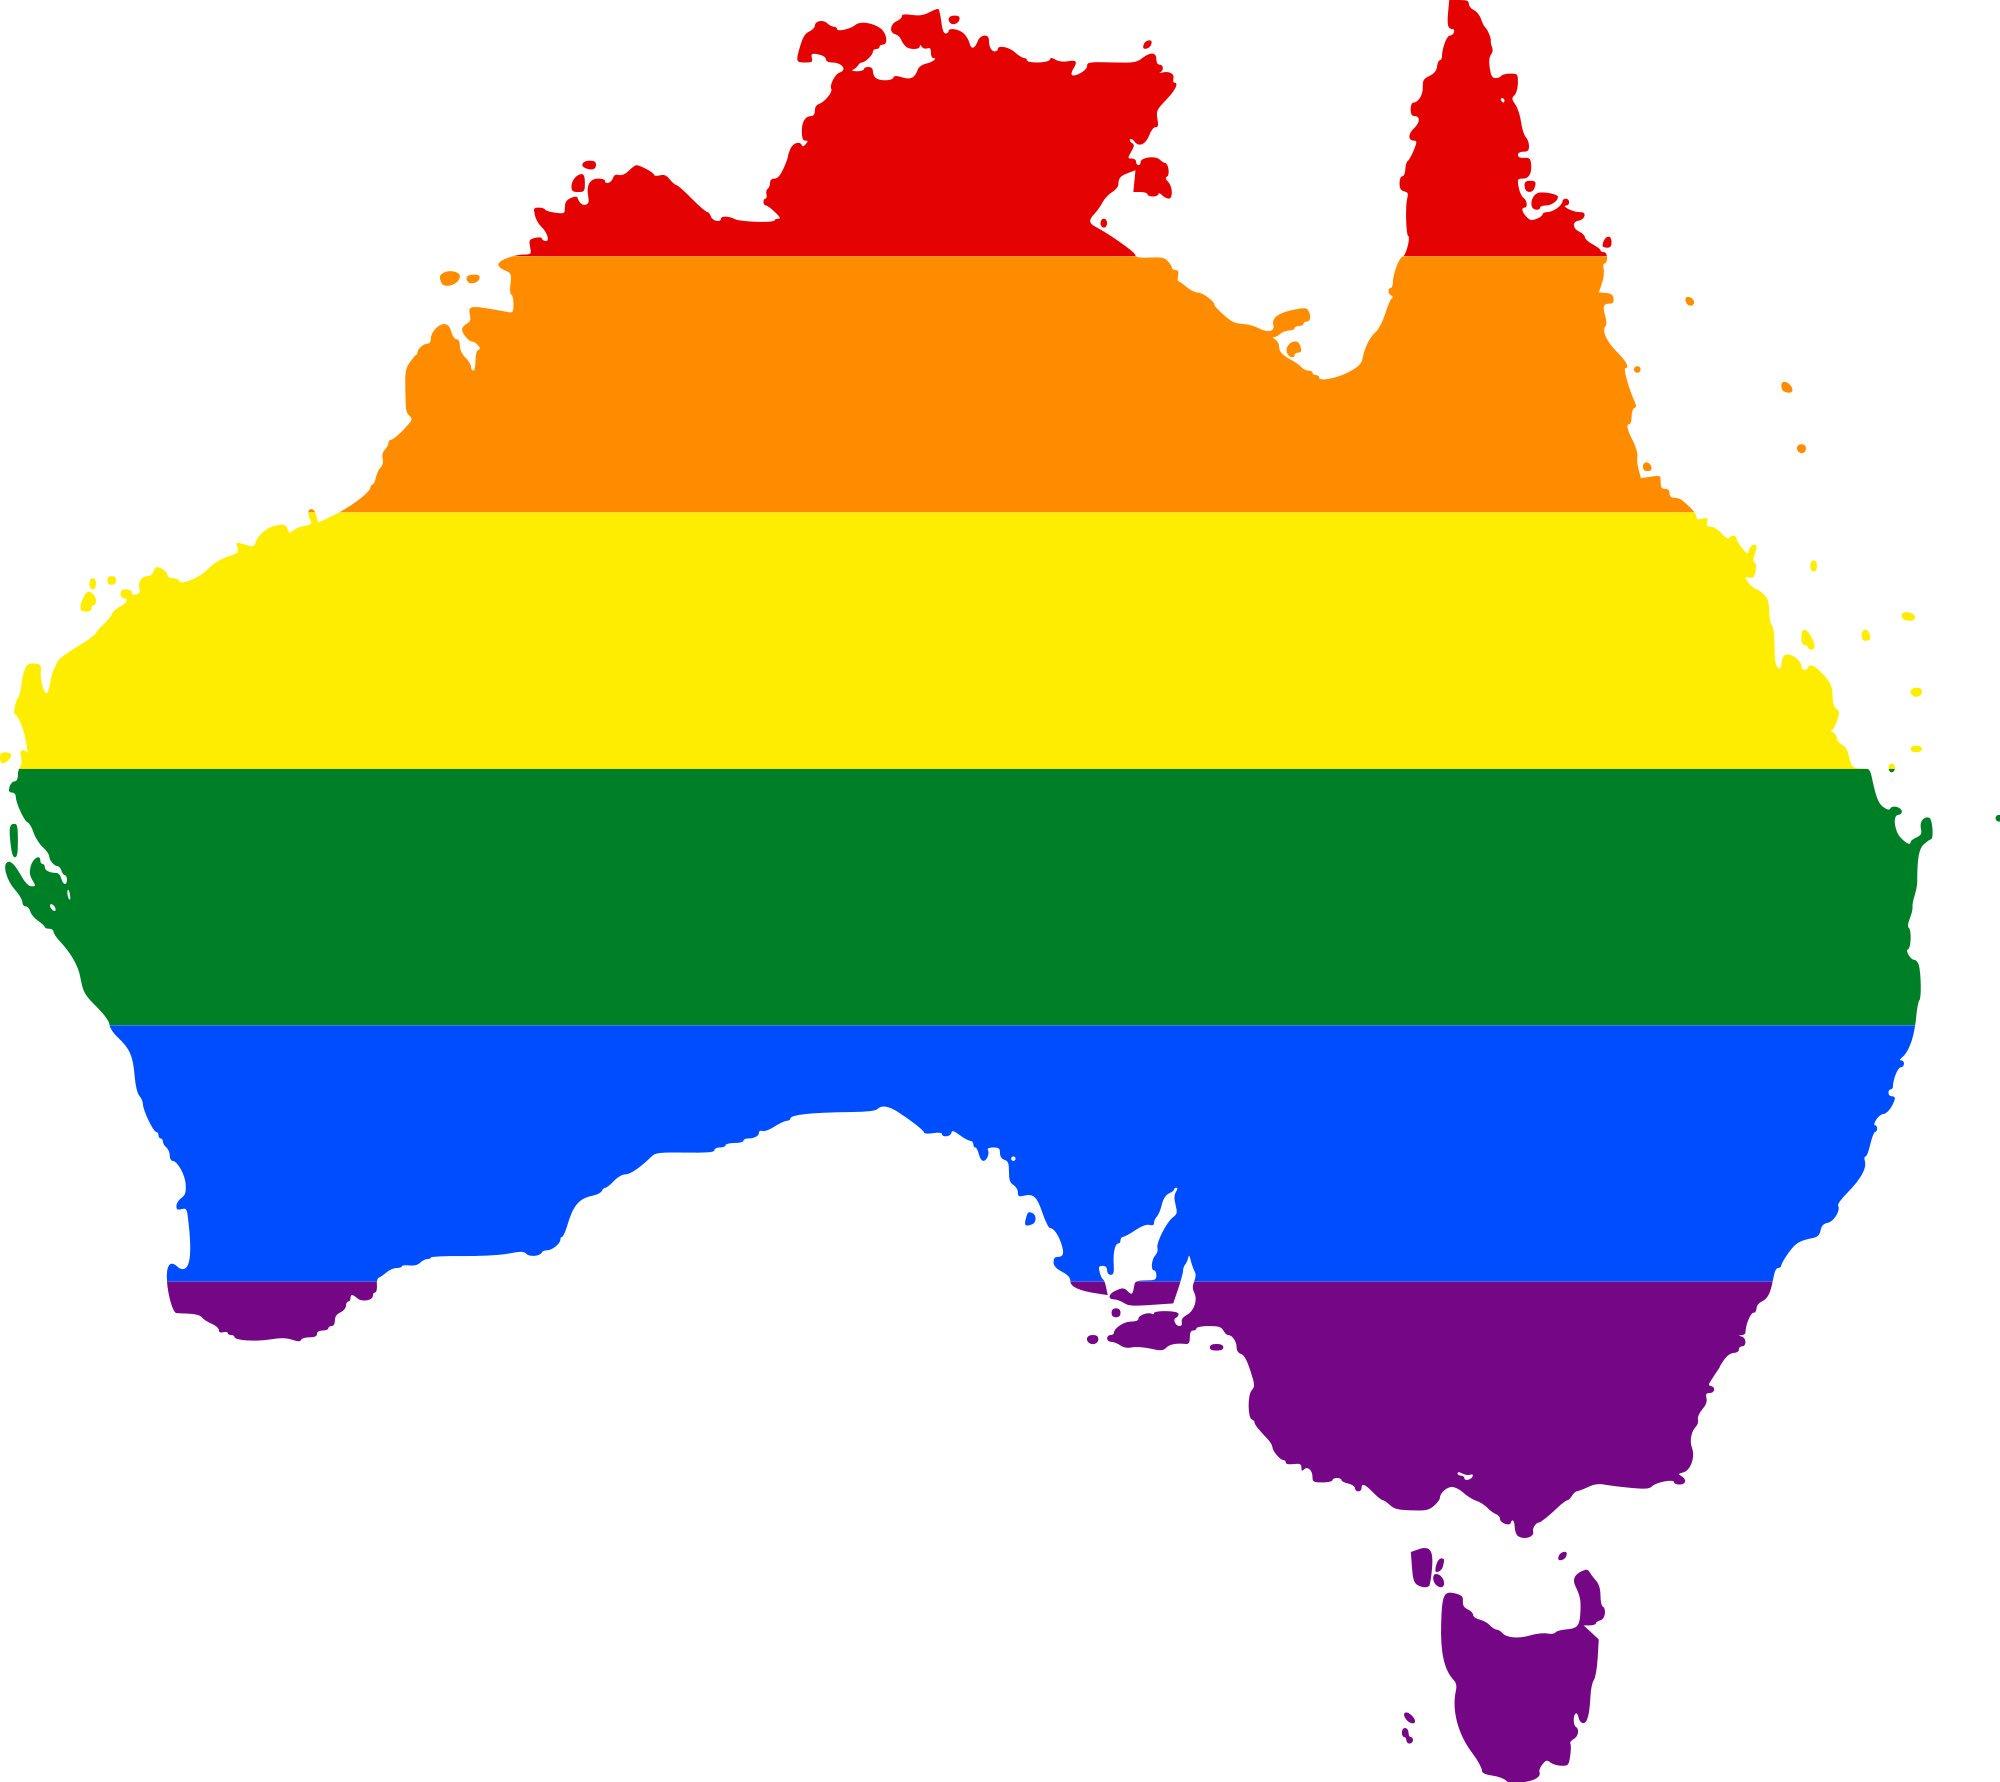 Australia Votes Yes